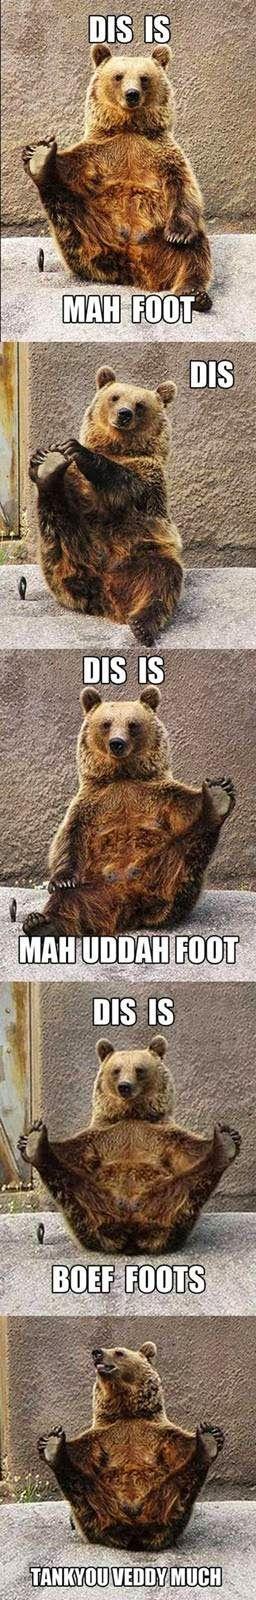 30 Funny animal captions - part 20 (30 pics)